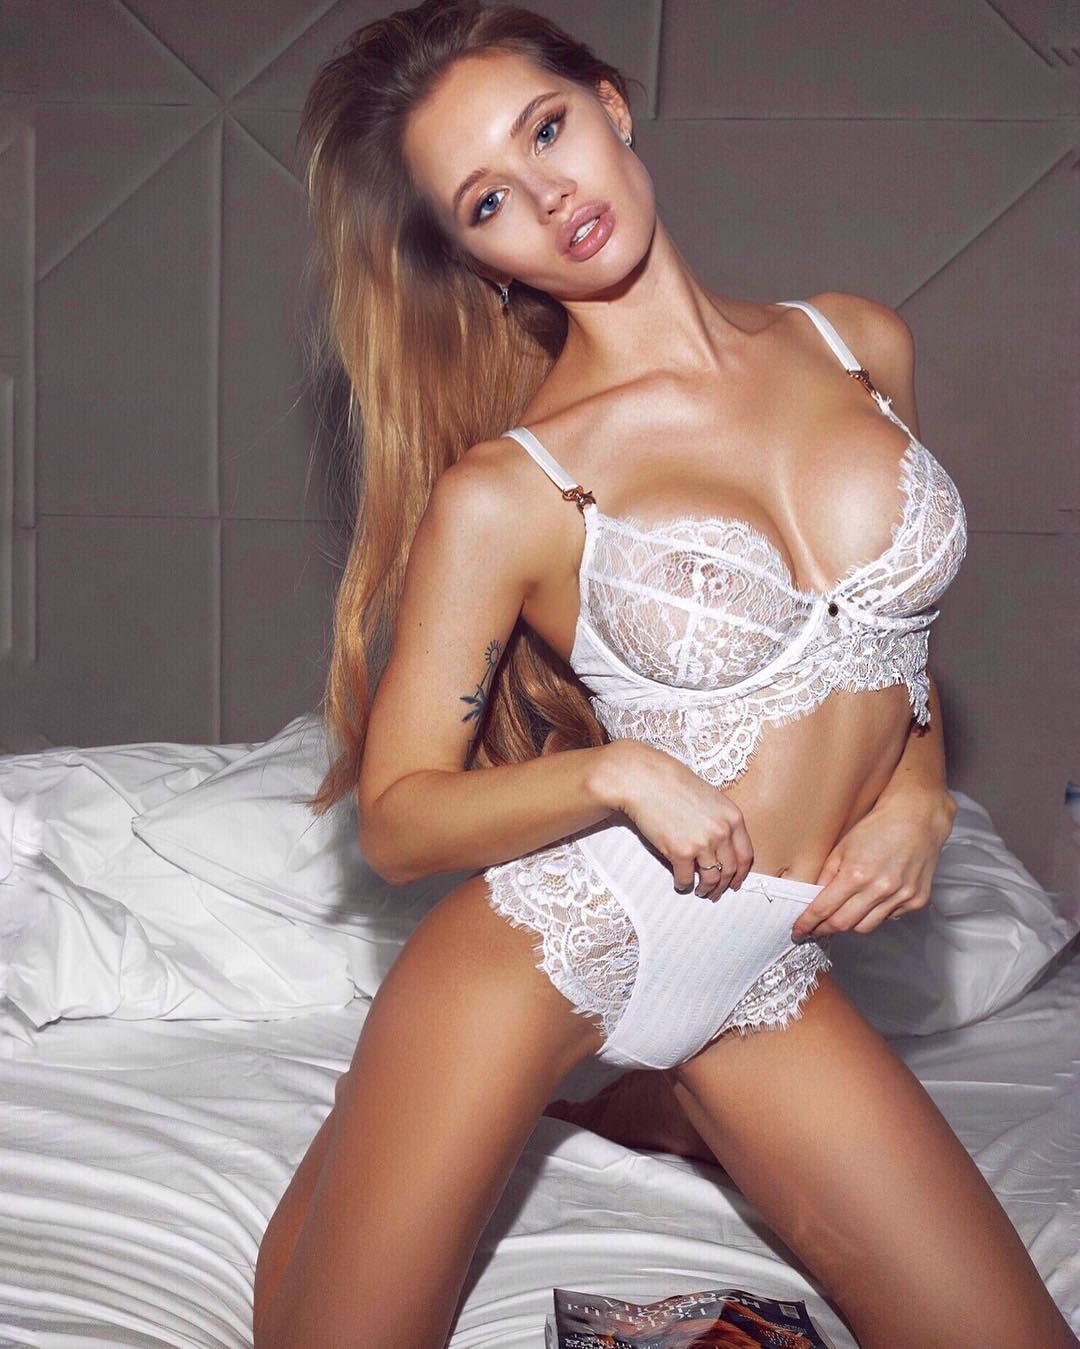 XXX Olya Abramovich nude photos 2019